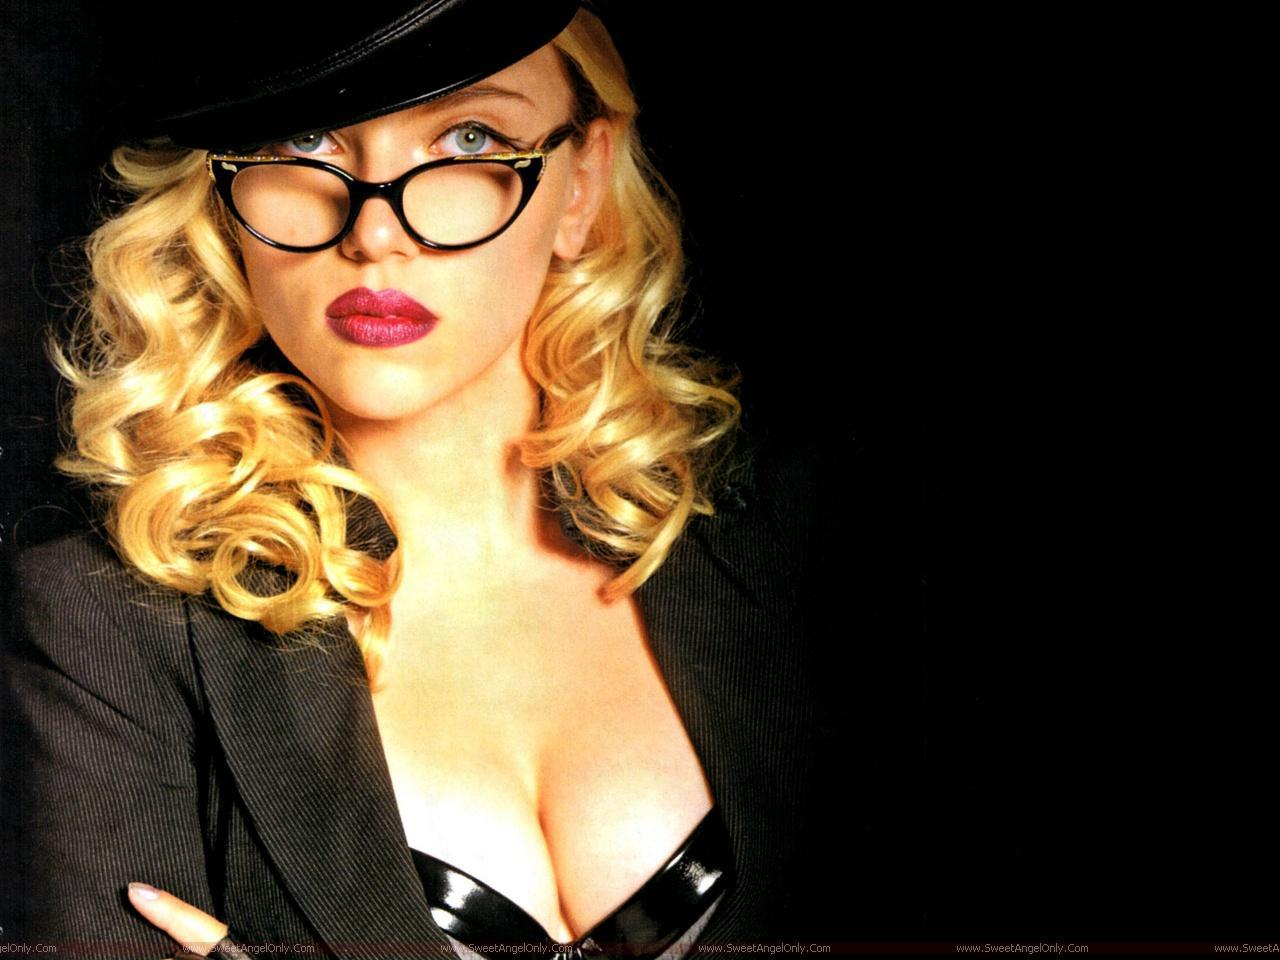 http://1.bp.blogspot.com/-Xy01aMUIOD4/ThHqOUMwQiI/AAAAAAAAHWw/8bI-IamFLcc/s1600/Hot_Scarlett_Johansson.jpg